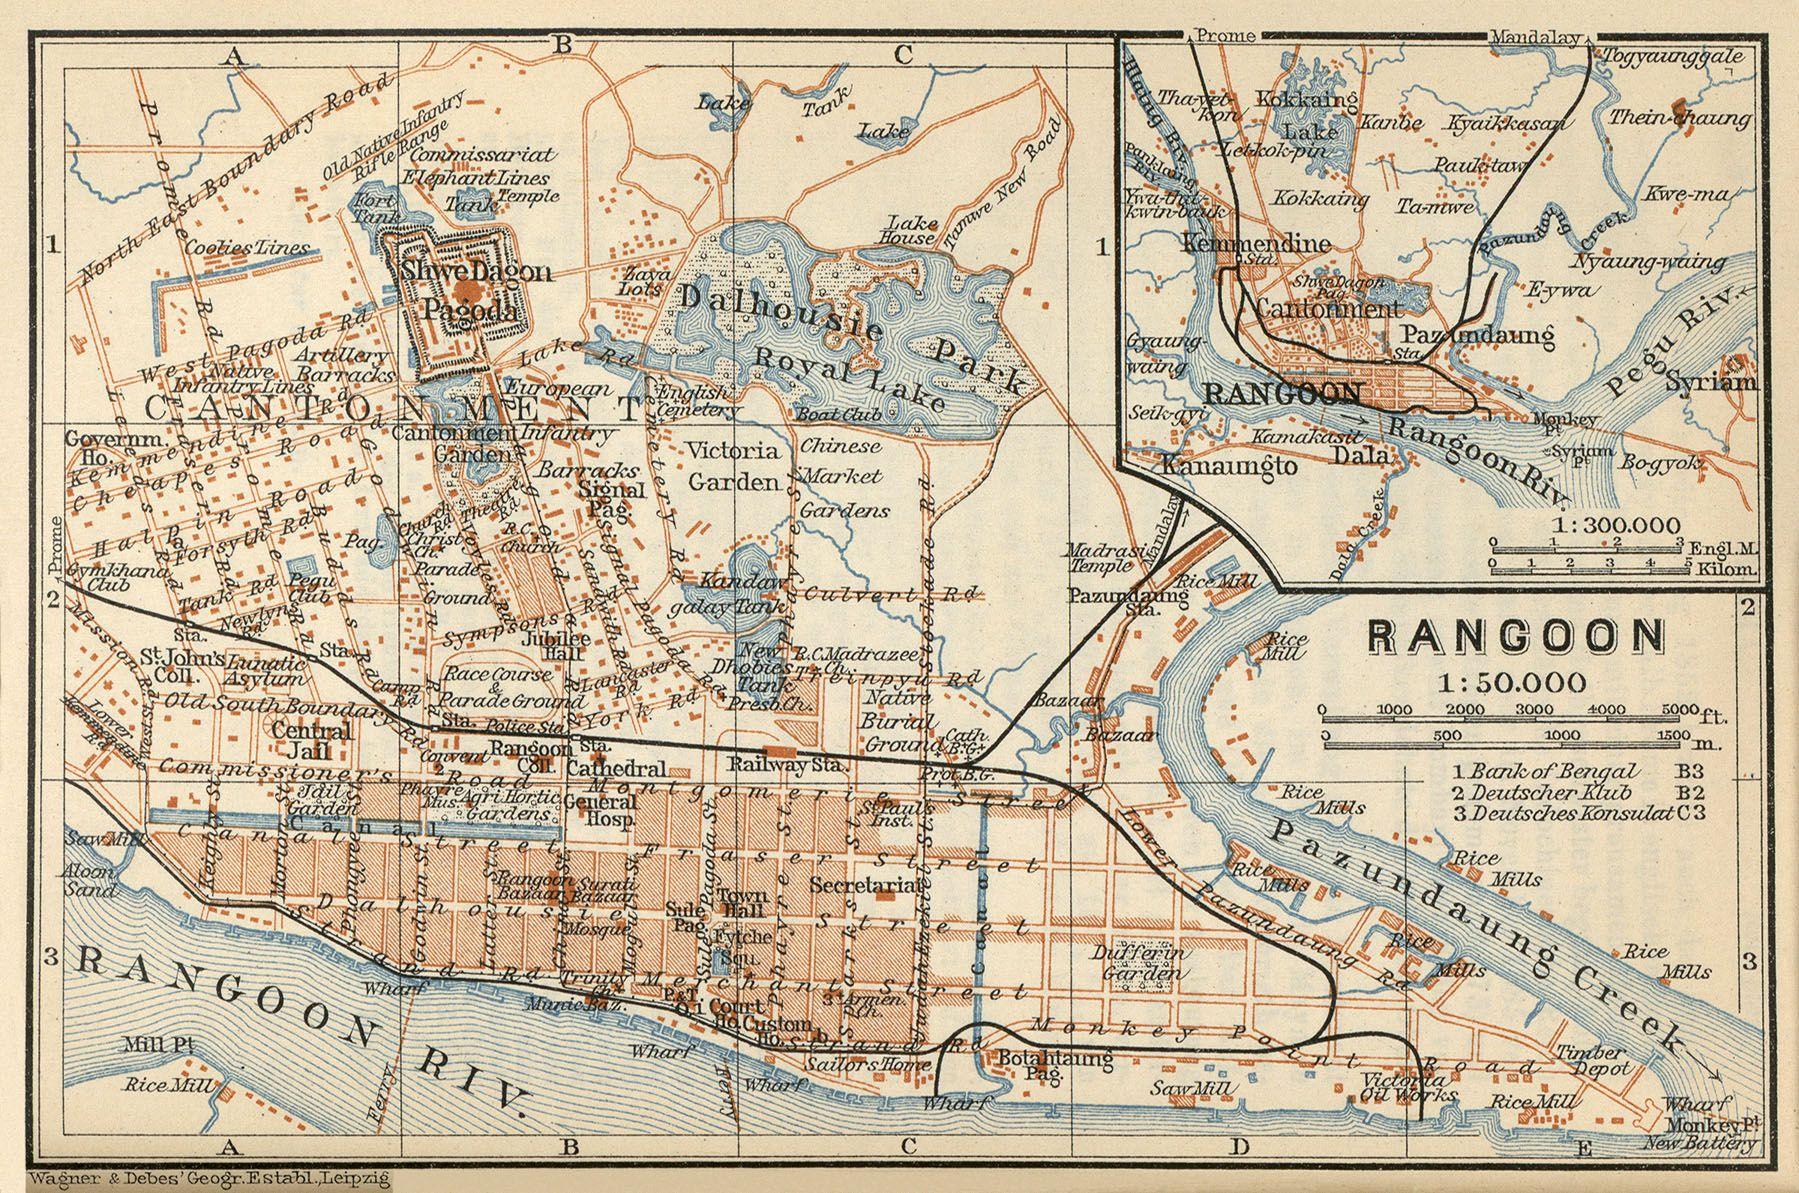 British Rangoon. | Everything | Yangon, Burma myanmar, Map on vientiane map, burma map, taiohae map, hanoi map, hong kong map, bumthang map, phnom penh, ho chi minh city, manila map, rangoon map, mekong river map, siem reap, jakarta map, islamabad map, bandar seri begawan map, great wall of china map, bangkok map, kuala lumpur, murang'a map, aung san suu kyi, burmese language, kuala lumpur map, taipei map, yangtze river map, naypyidaw map, myanmar map,